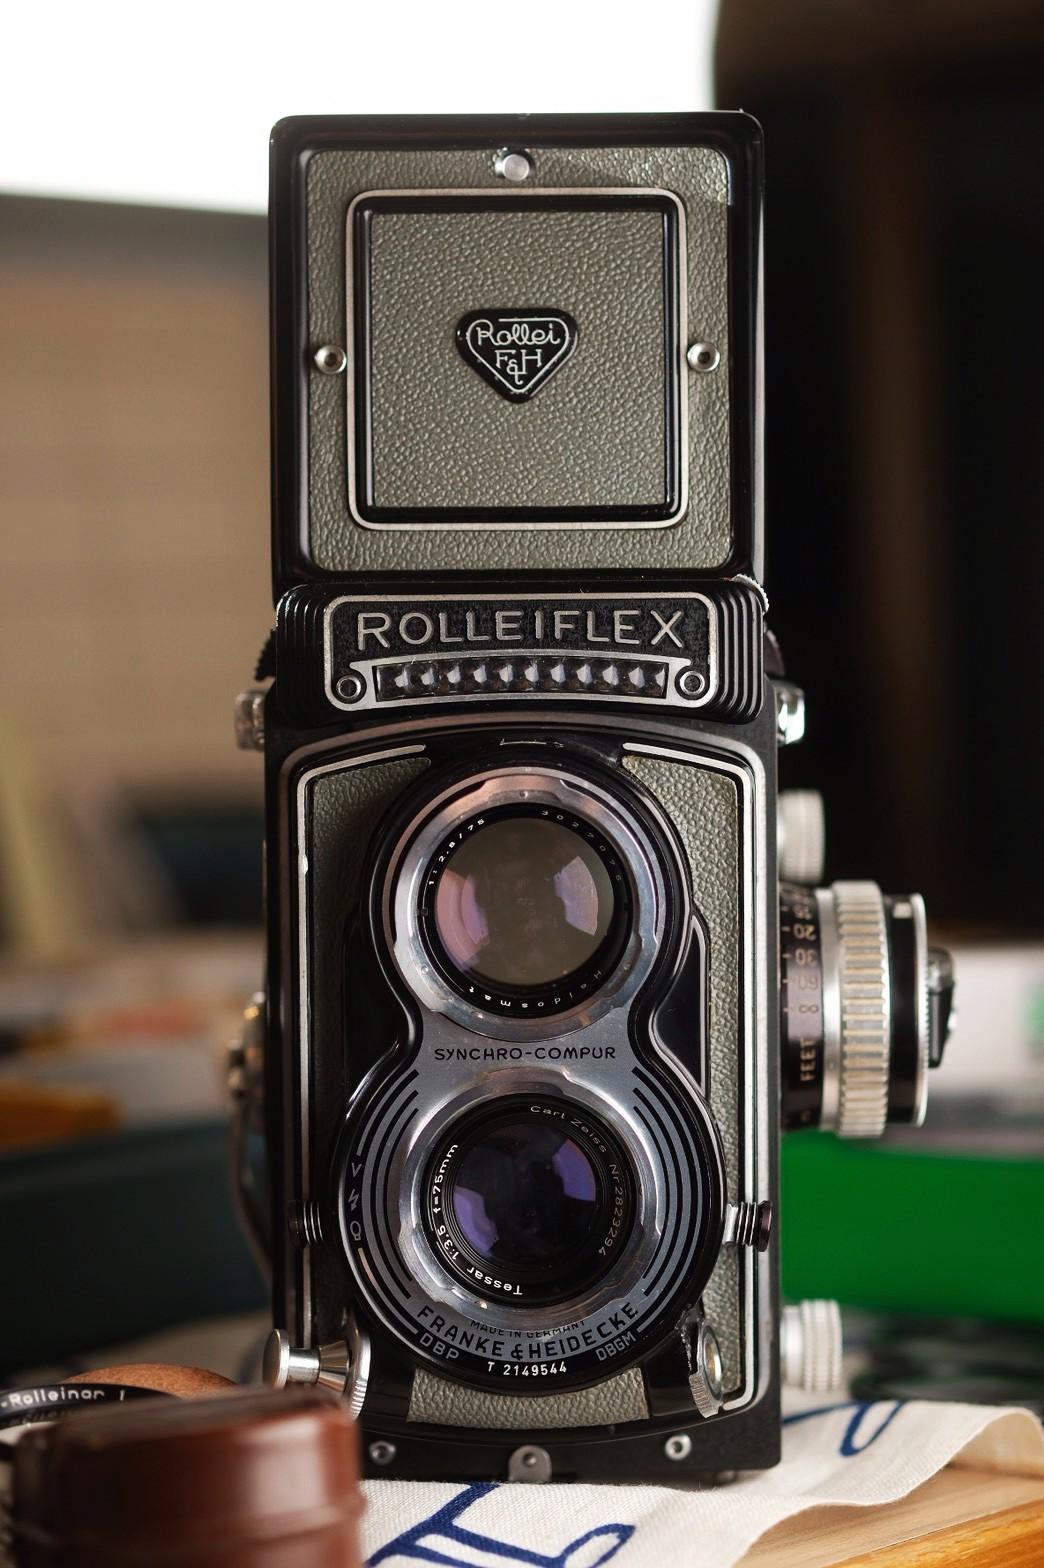 Rolleiflex T (3.5T) 灰色蒙皮版